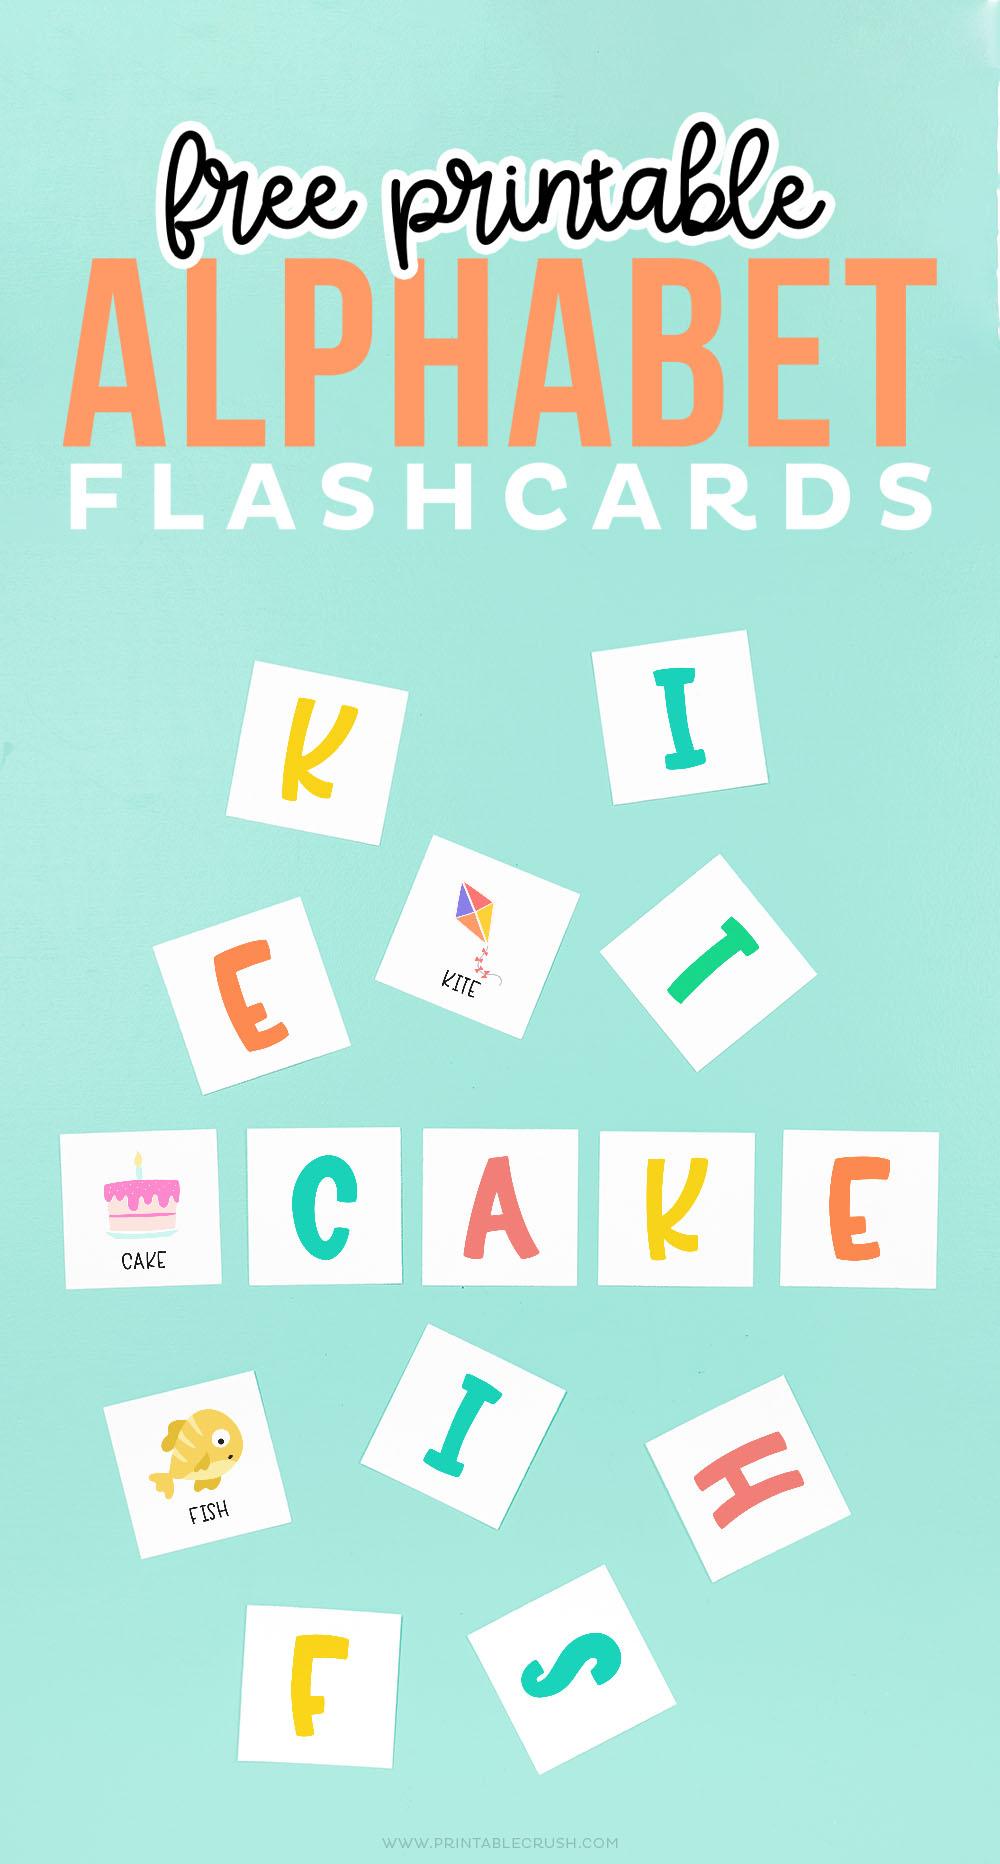 Free Alphabet Flashcards for kindergartners - Printable Crush